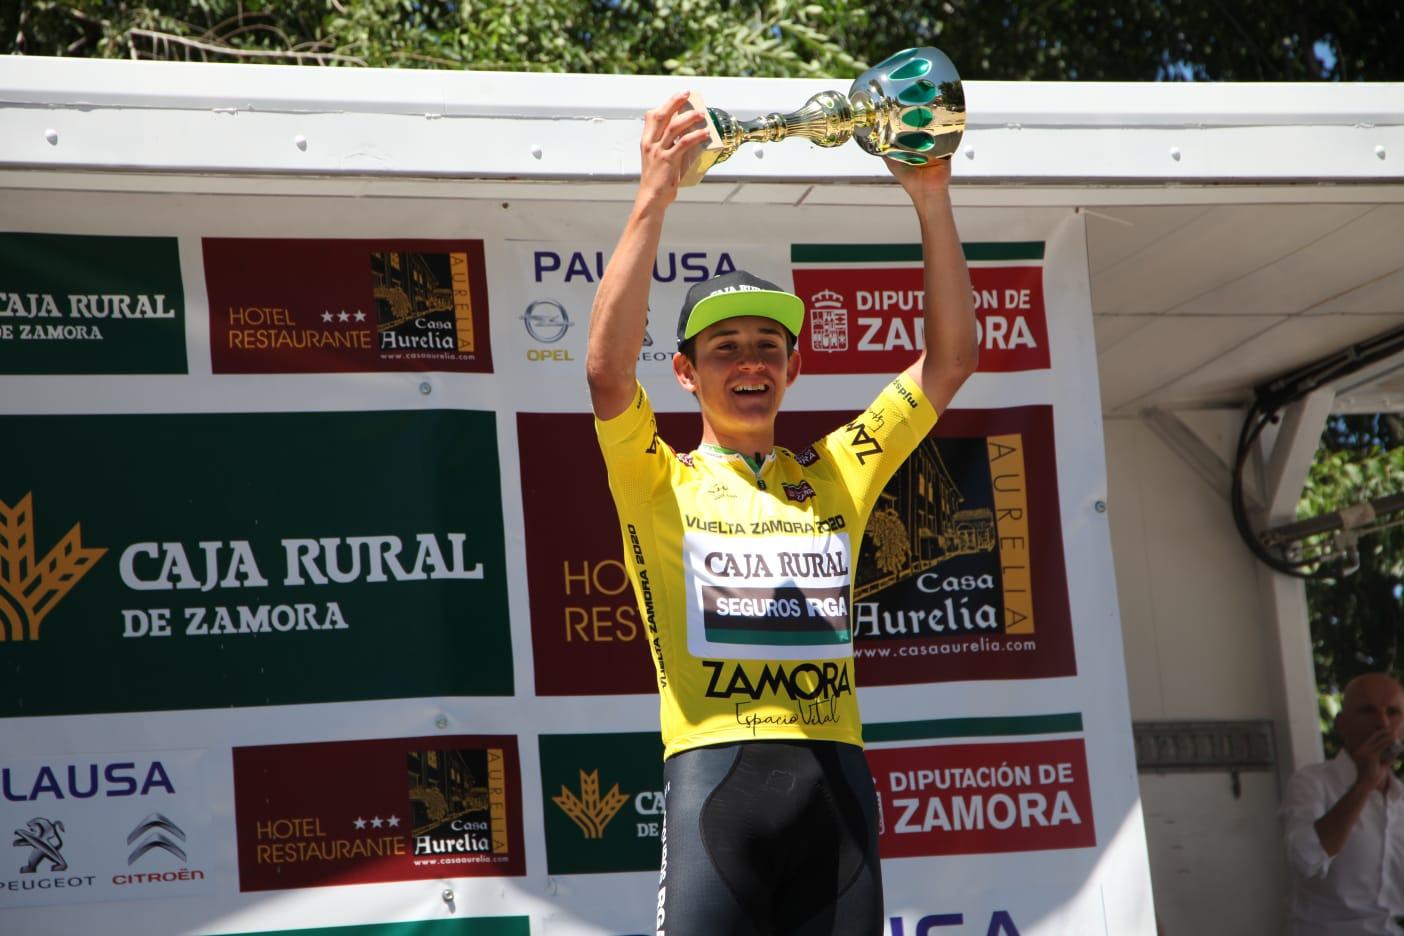 Josu Etxeberria certifica su victoria en la Vuelta a Zamora